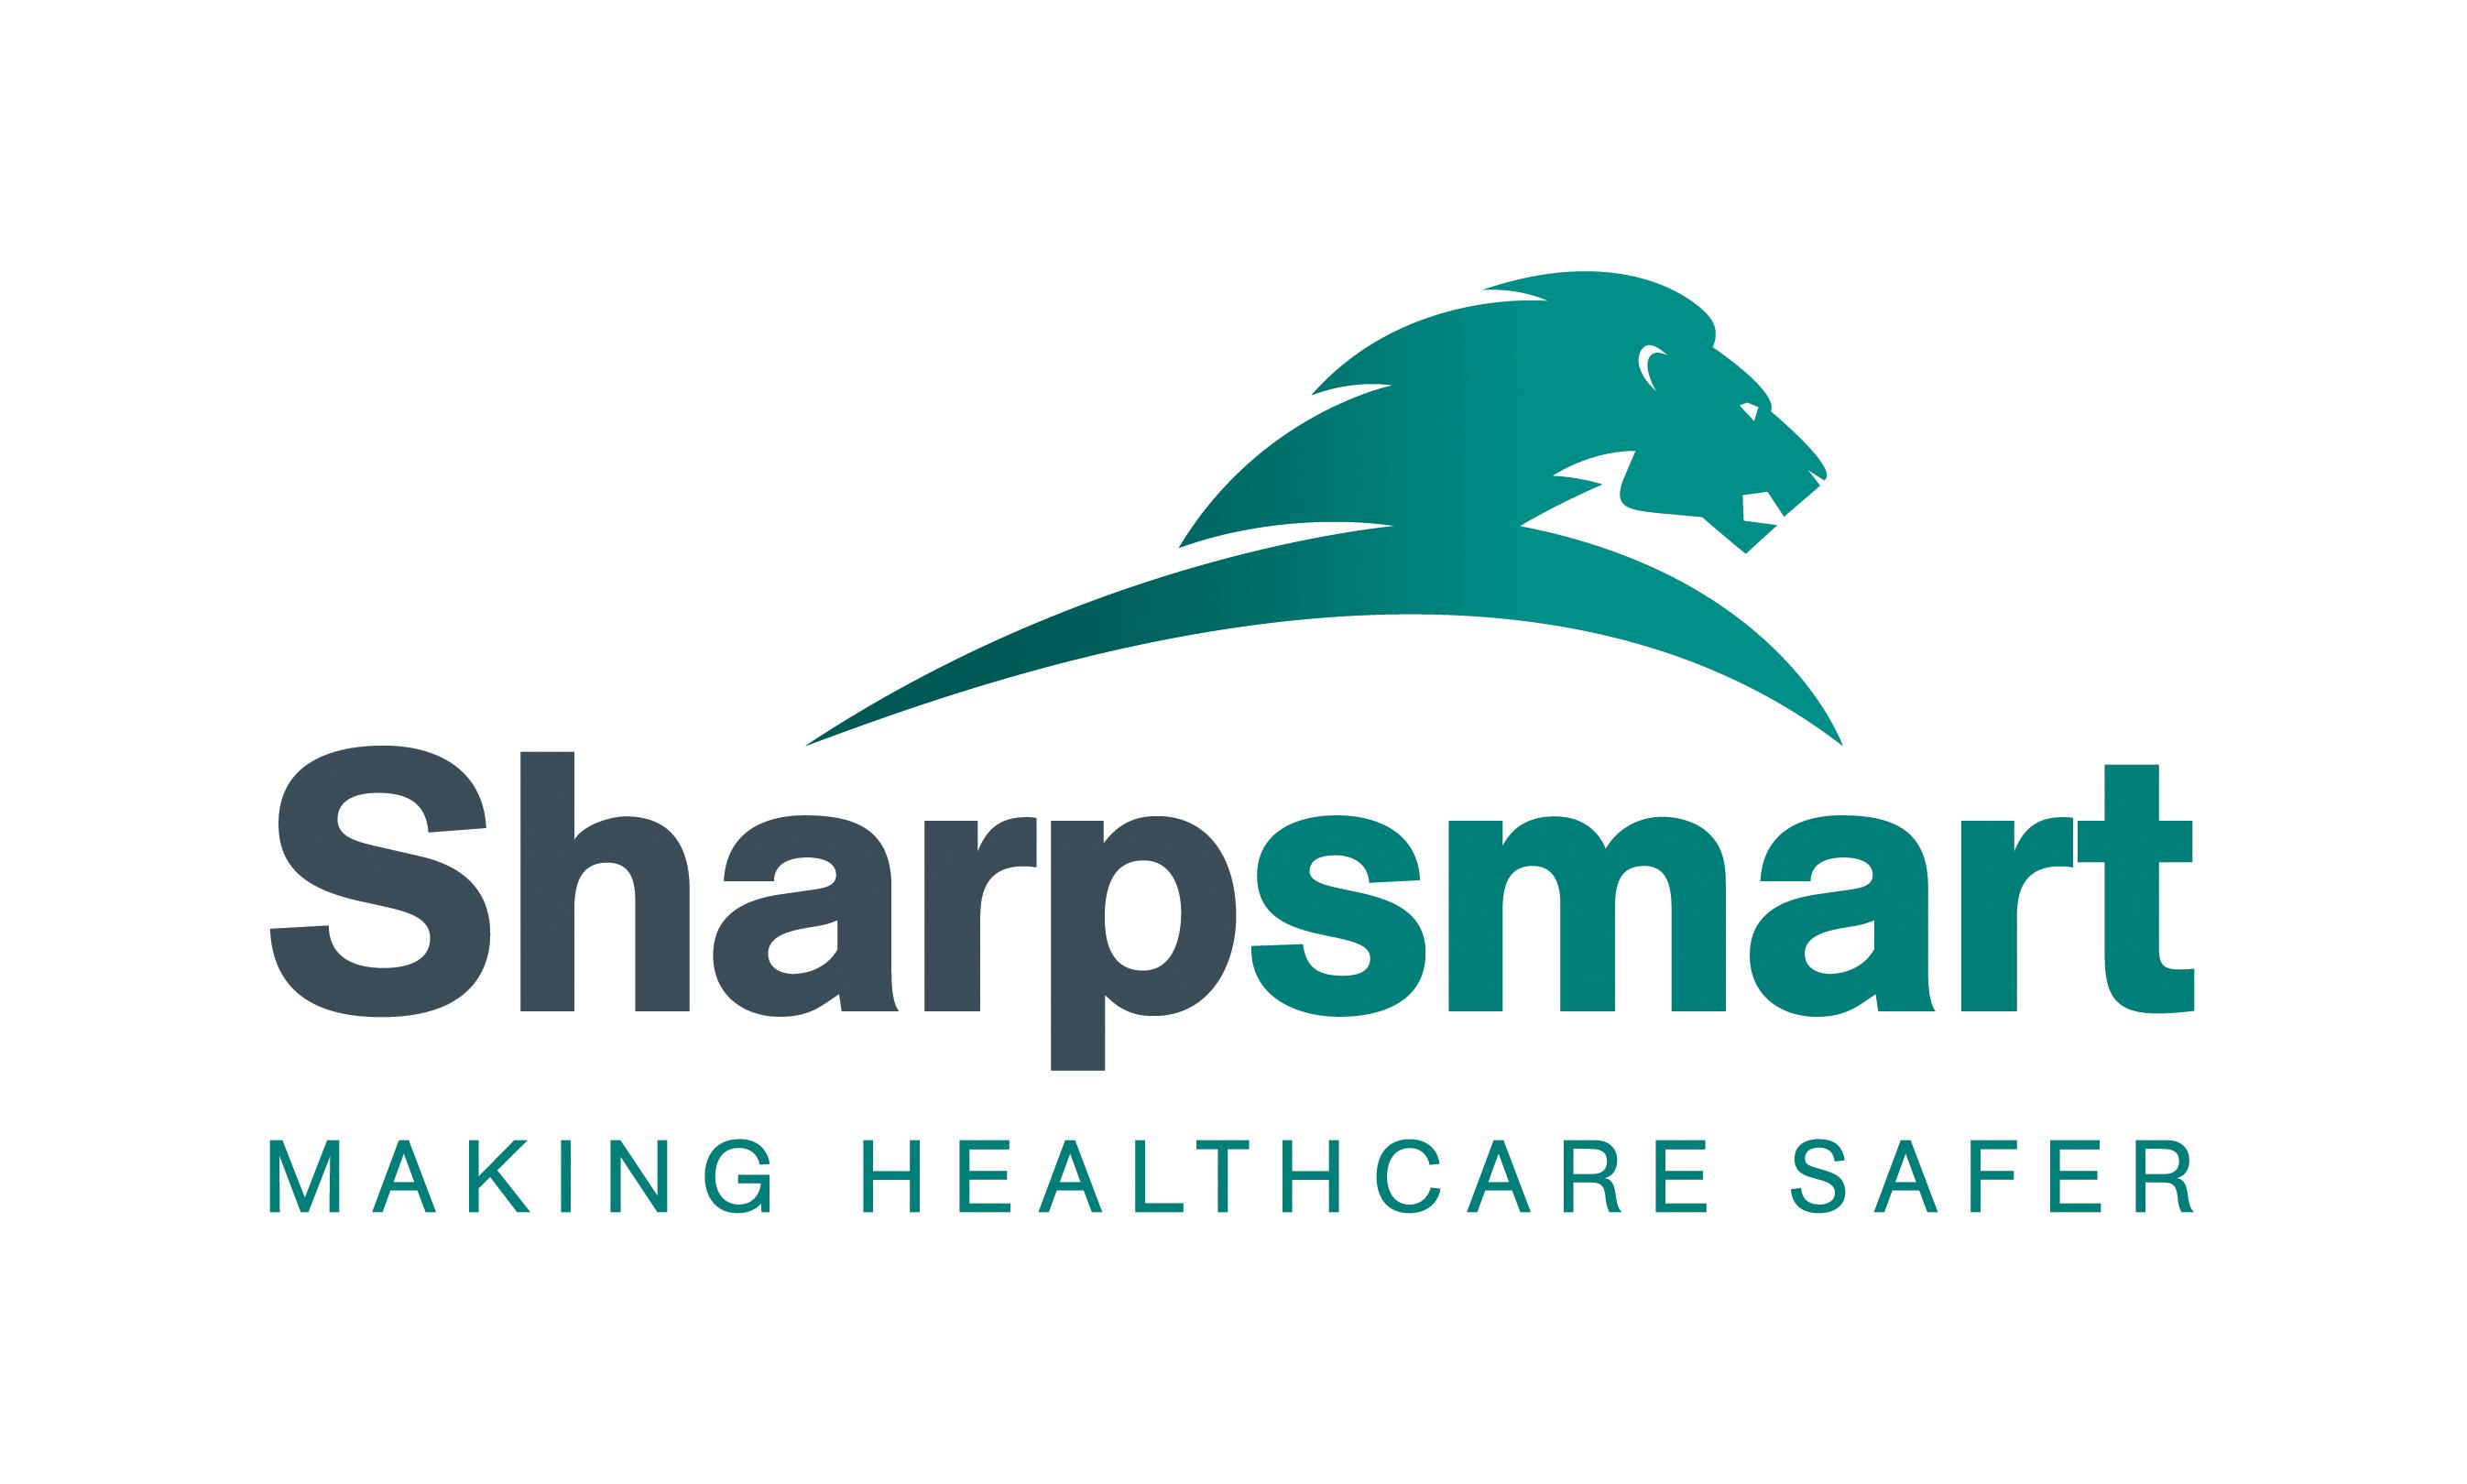 Sharpsmart logo